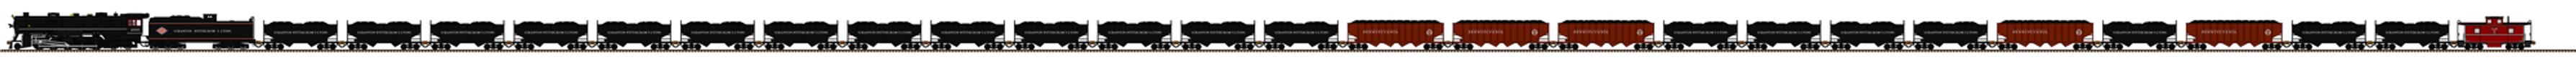 SPL Coal drag by Andrewk4